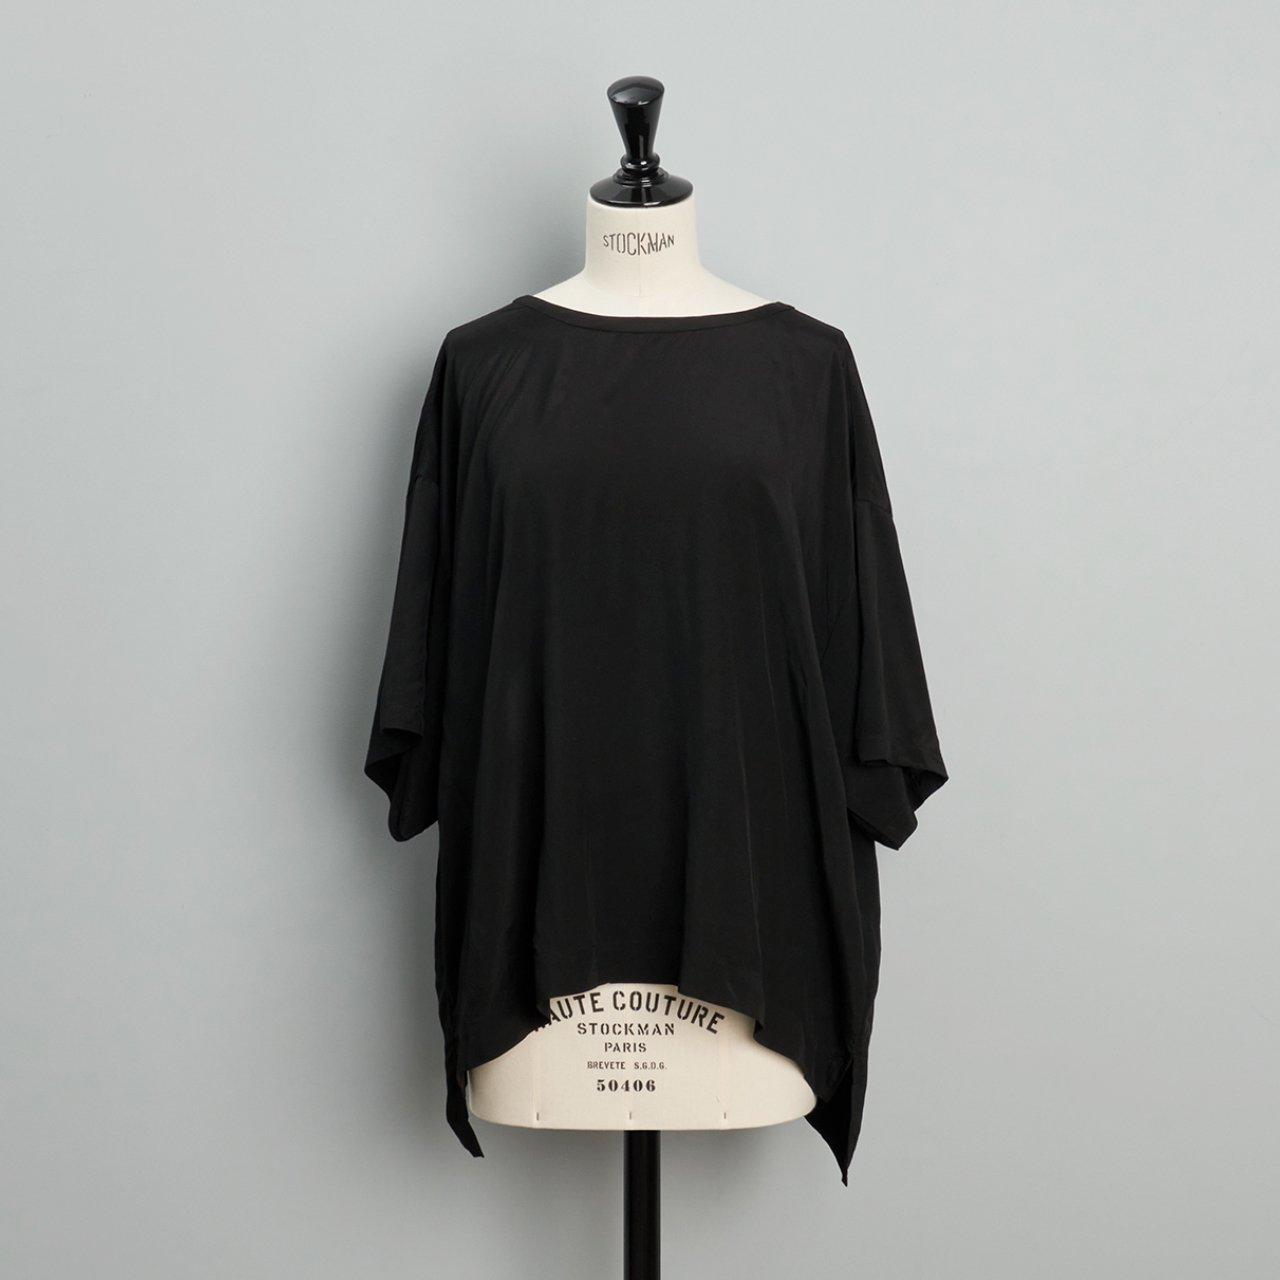 suzuki takayuki<BR>pullover blouse<BR>black